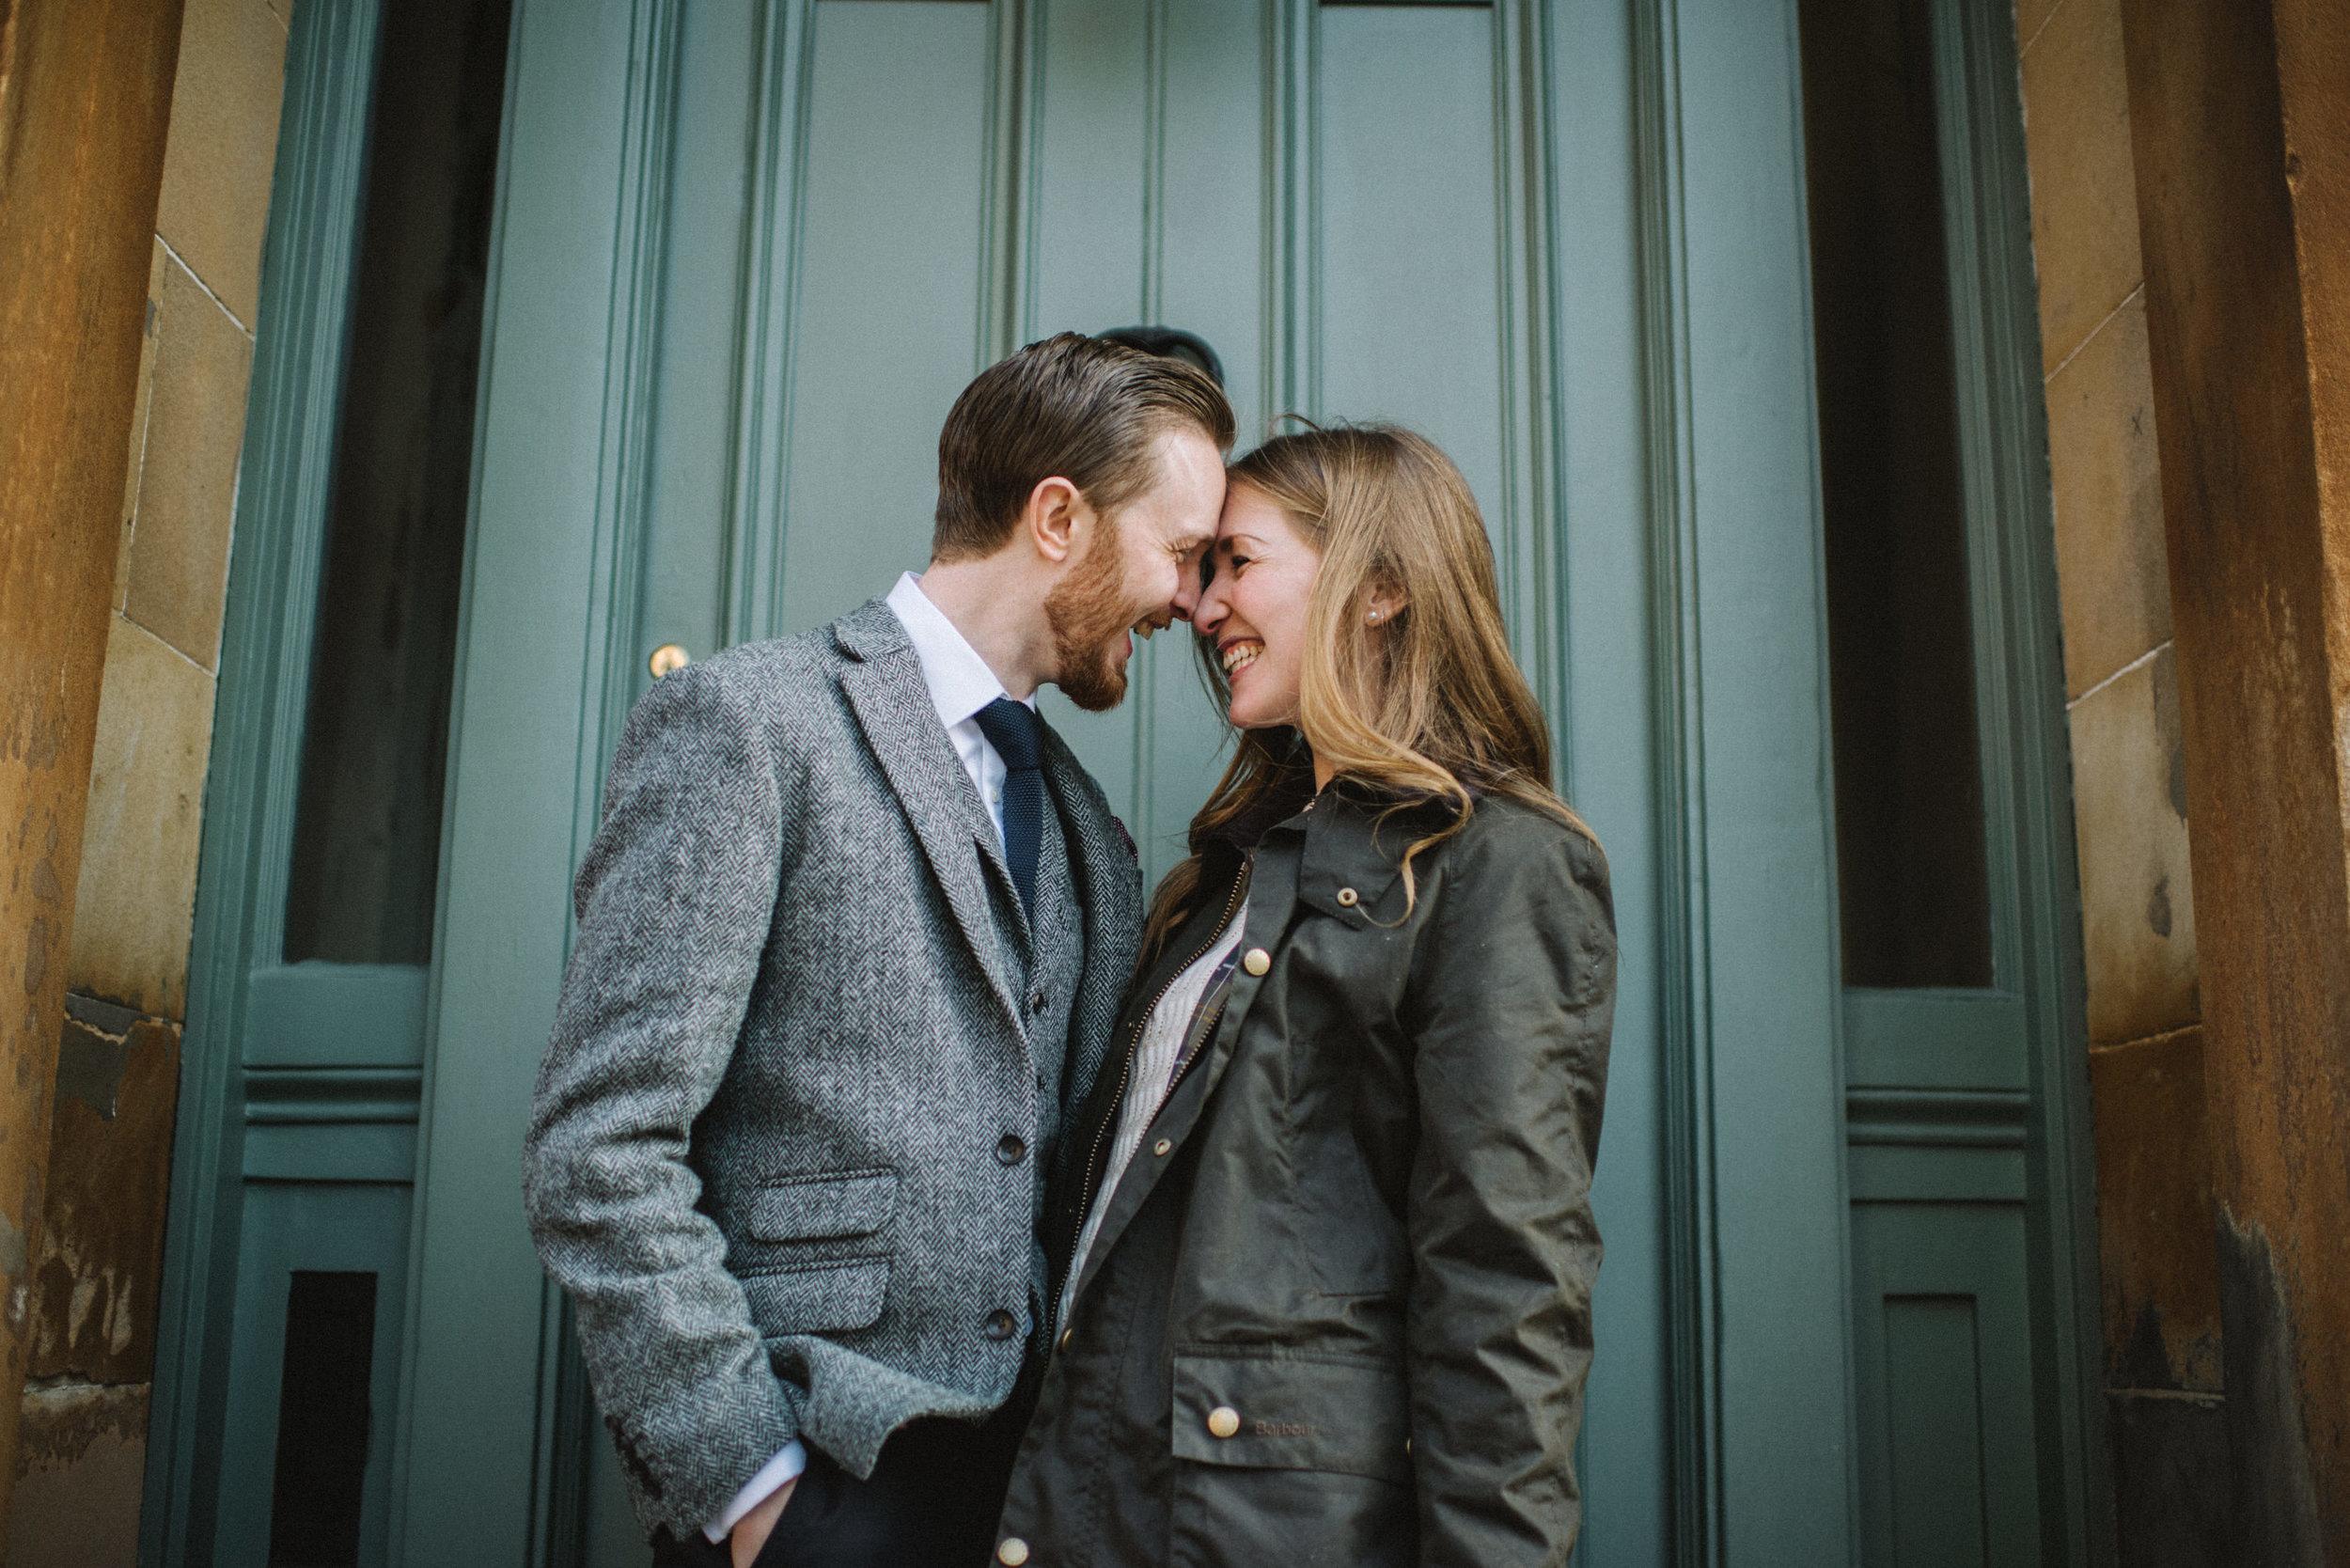 0154-LISA-DEVINE-PHOTOGRAPHY-ALTERNATIVE-WEDDING-PHOTOGRAPHY-SCOTLAND-DESTINATION-WEDDINGS-GLASGOW-WEDDINGS-COOL-WEDDINGS-STYLISH-WEDDINGS.JPG